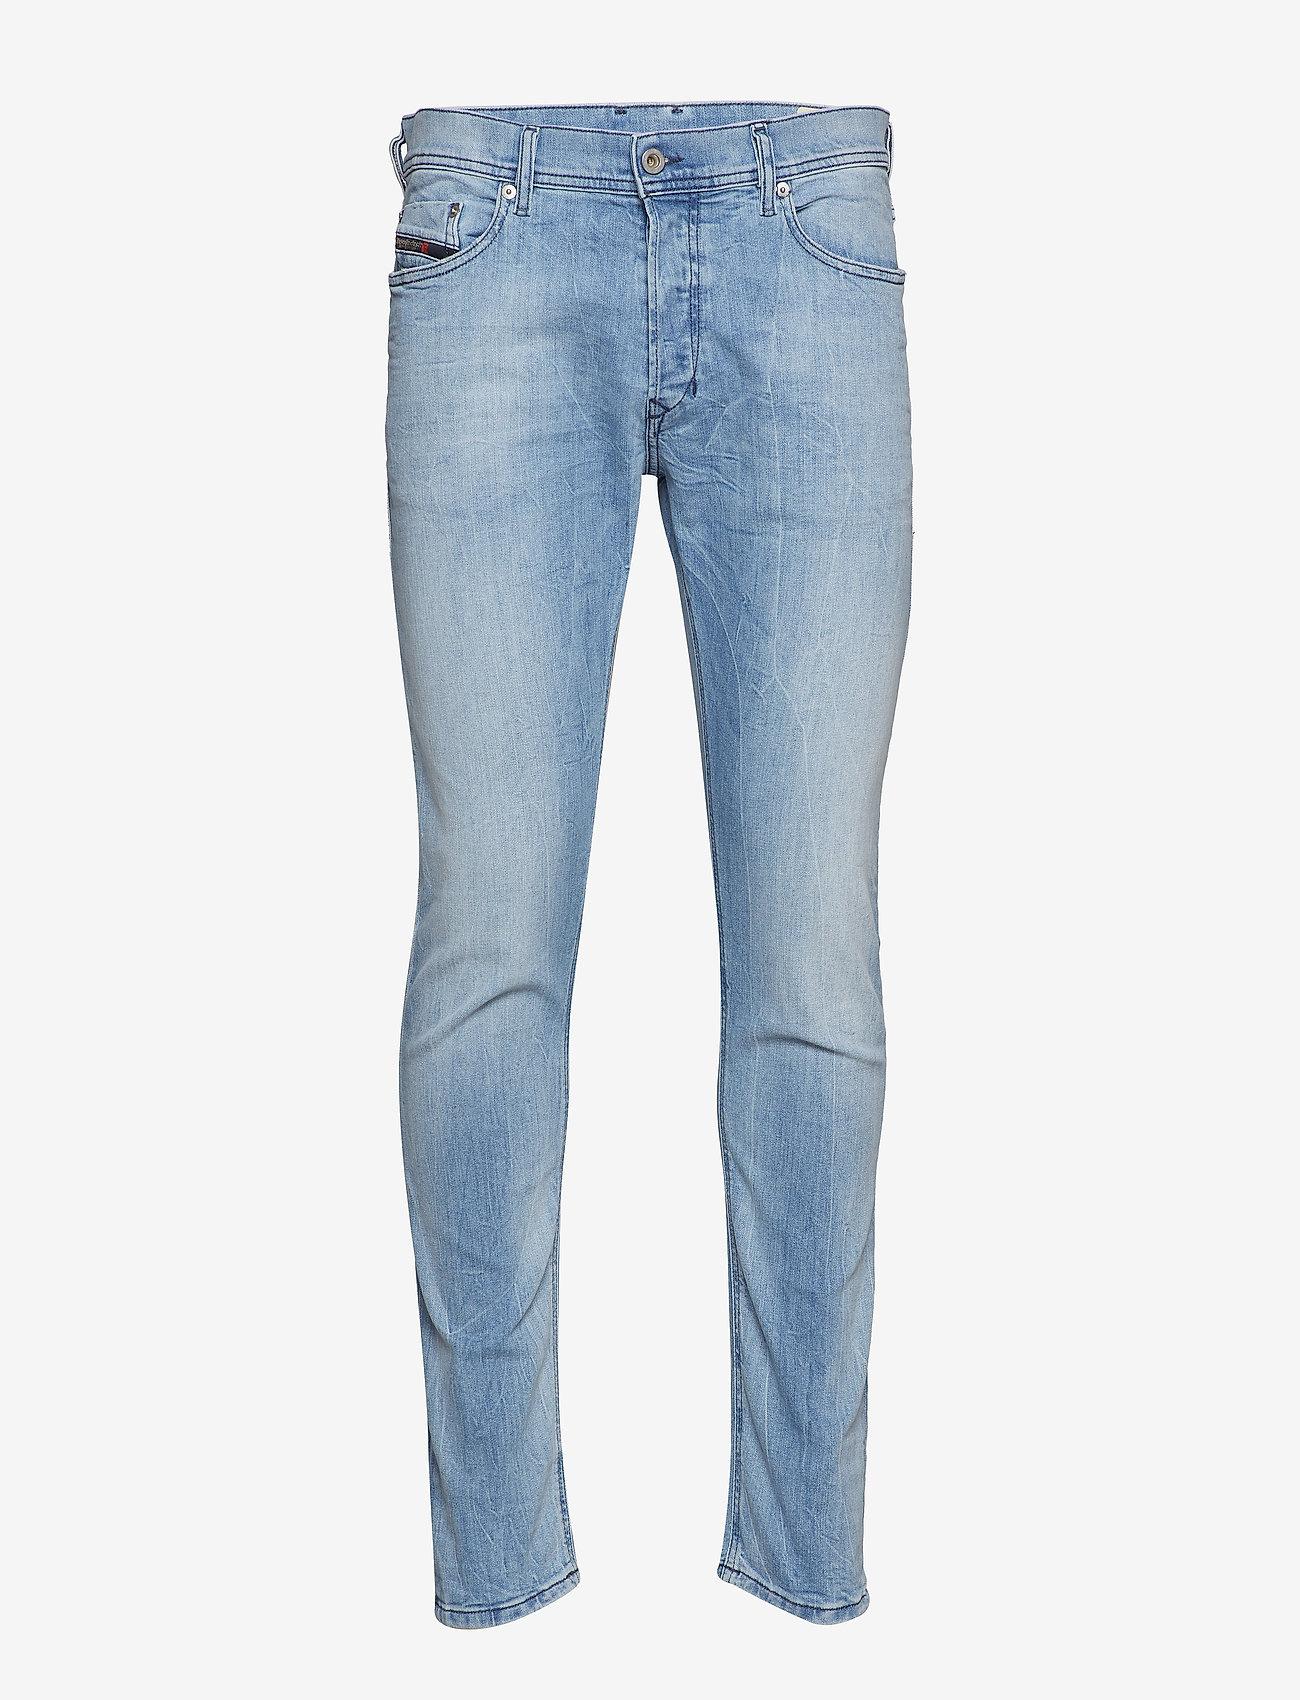 Diesel Men - TEPPHAR TROUSERS - slim jeans - denim